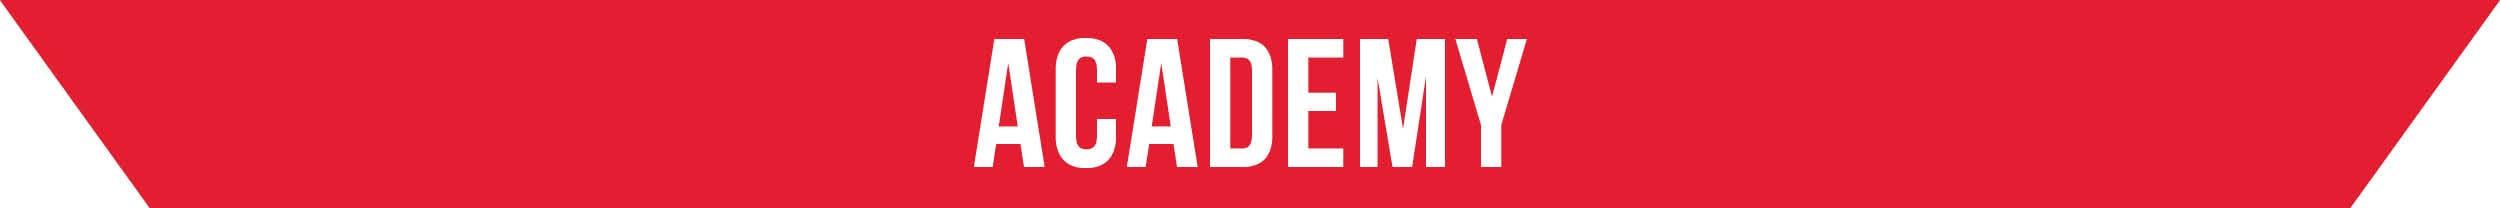 Academy - Banner.jpg